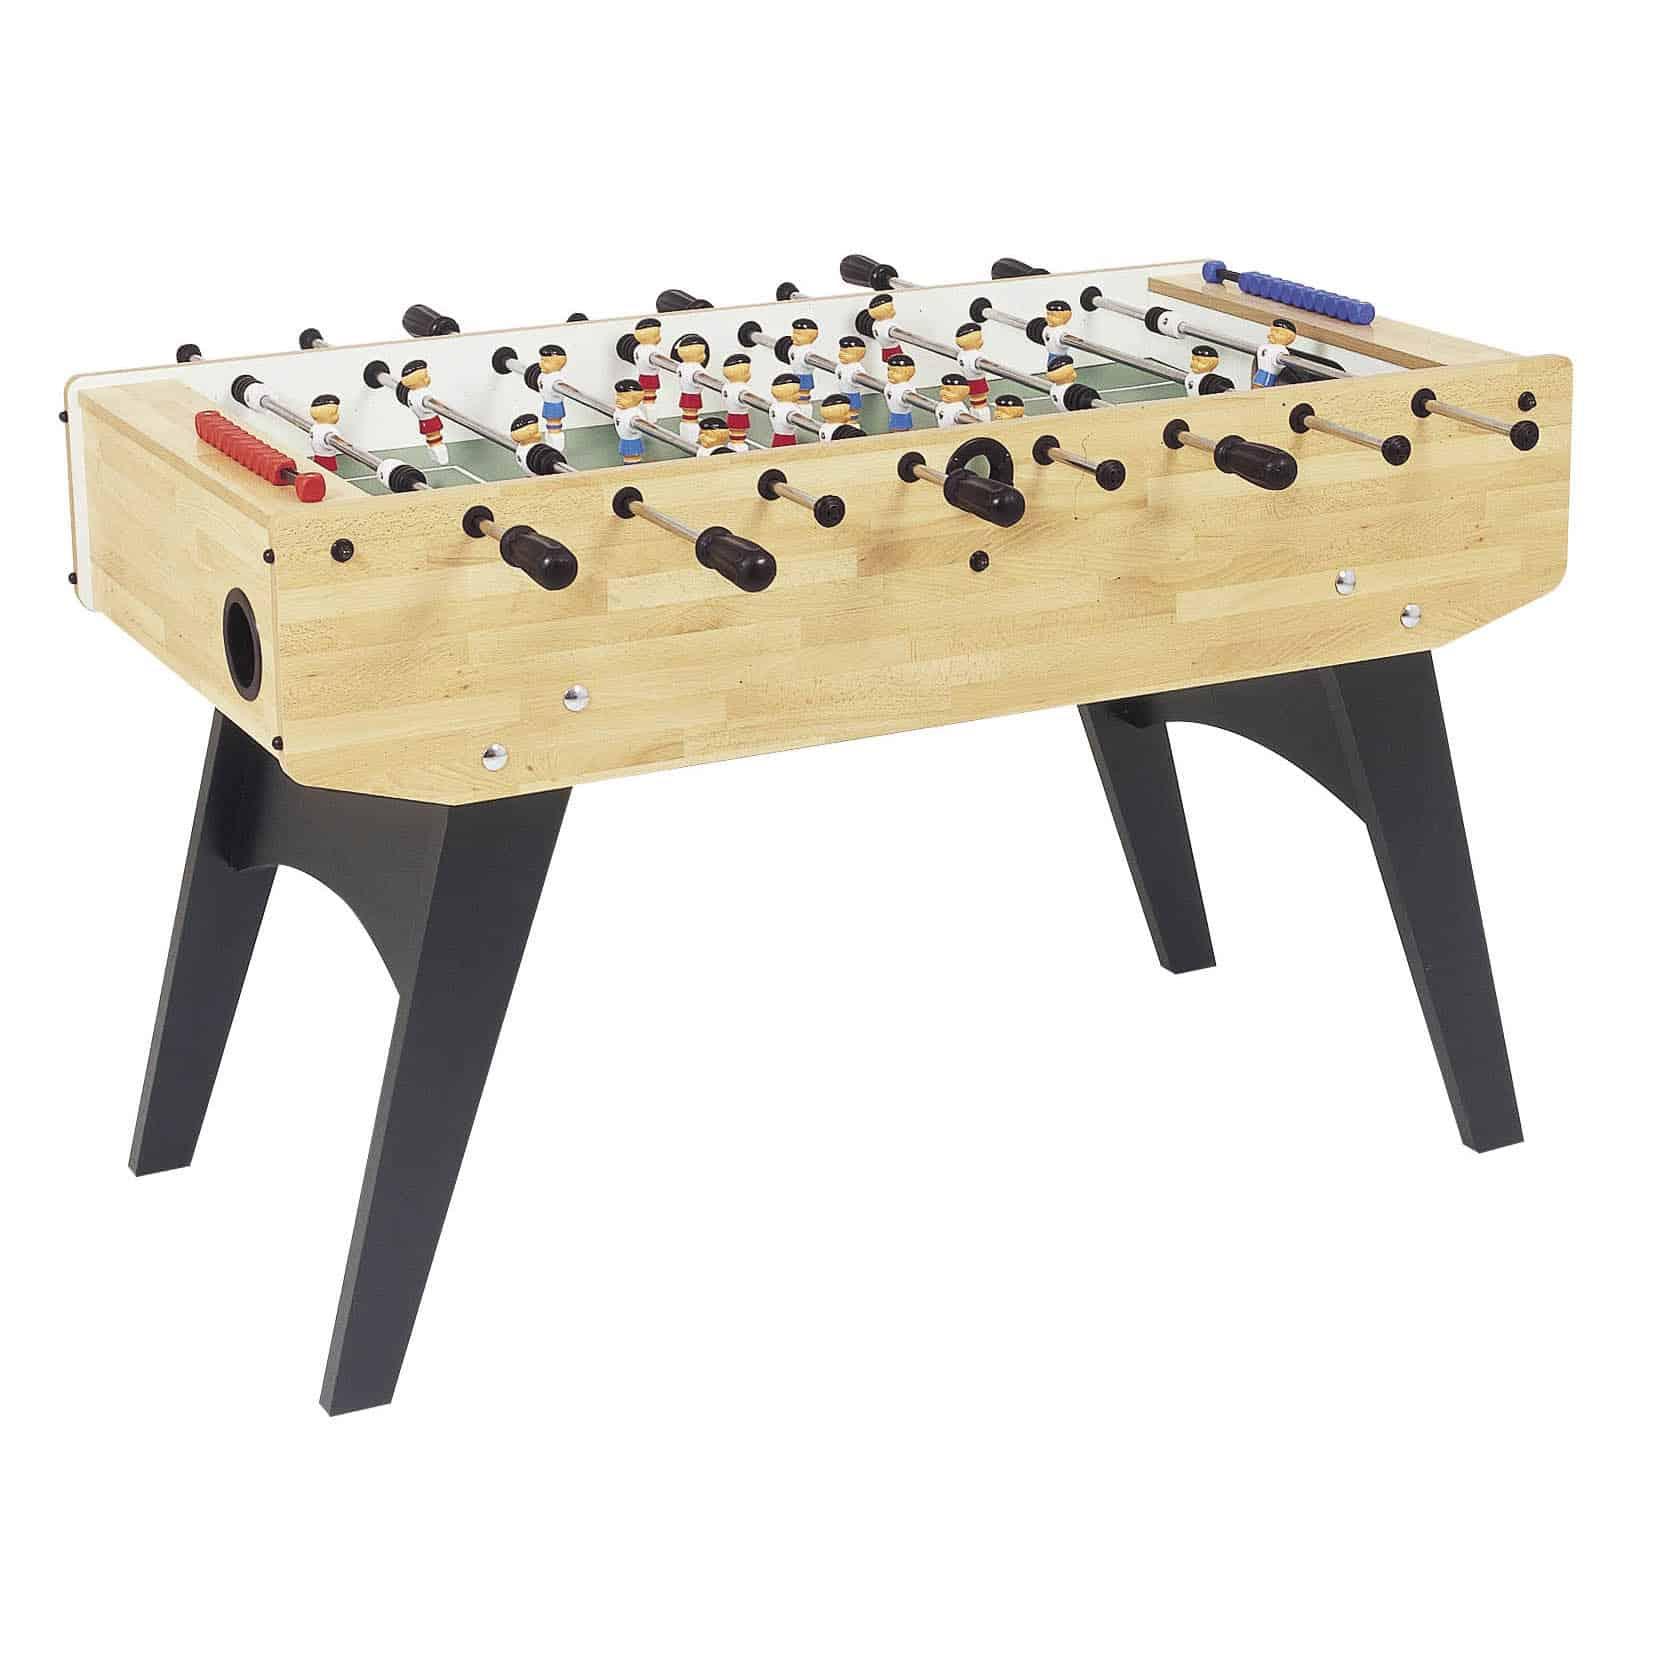 Garlando F20 Foldable Table Football Beech